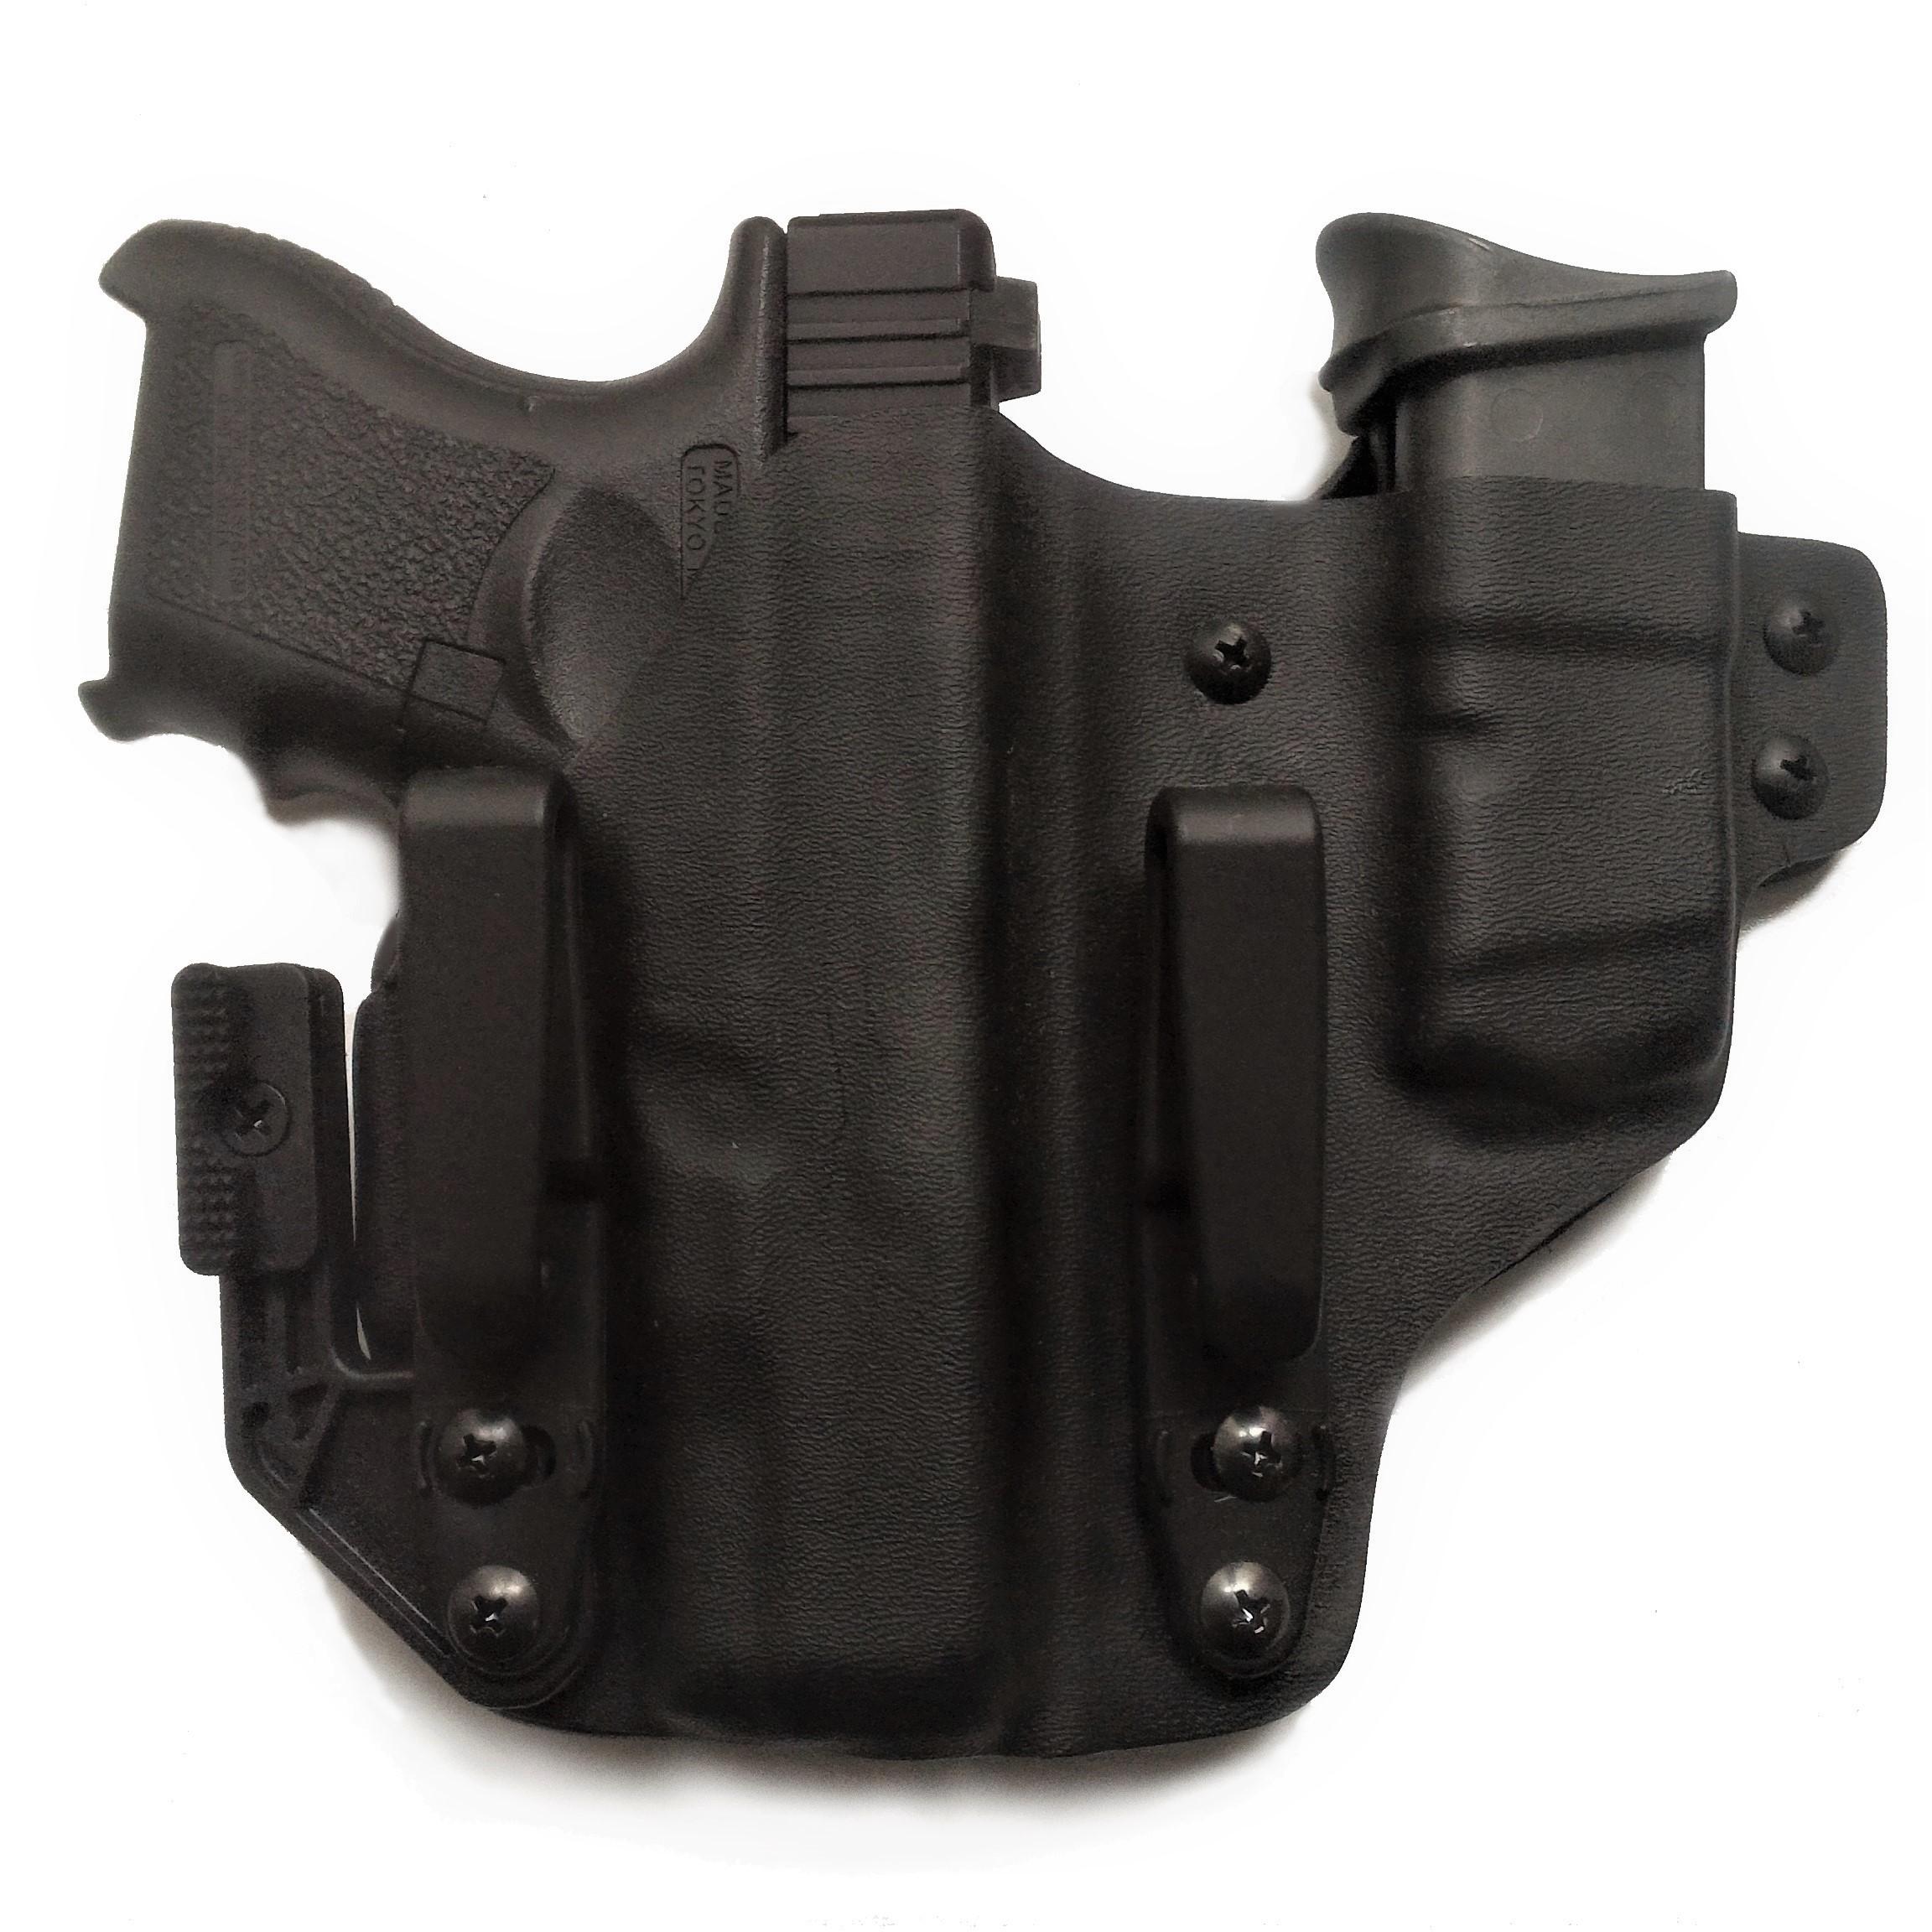 holster kydex fantome xl etfr glock 26 appendix